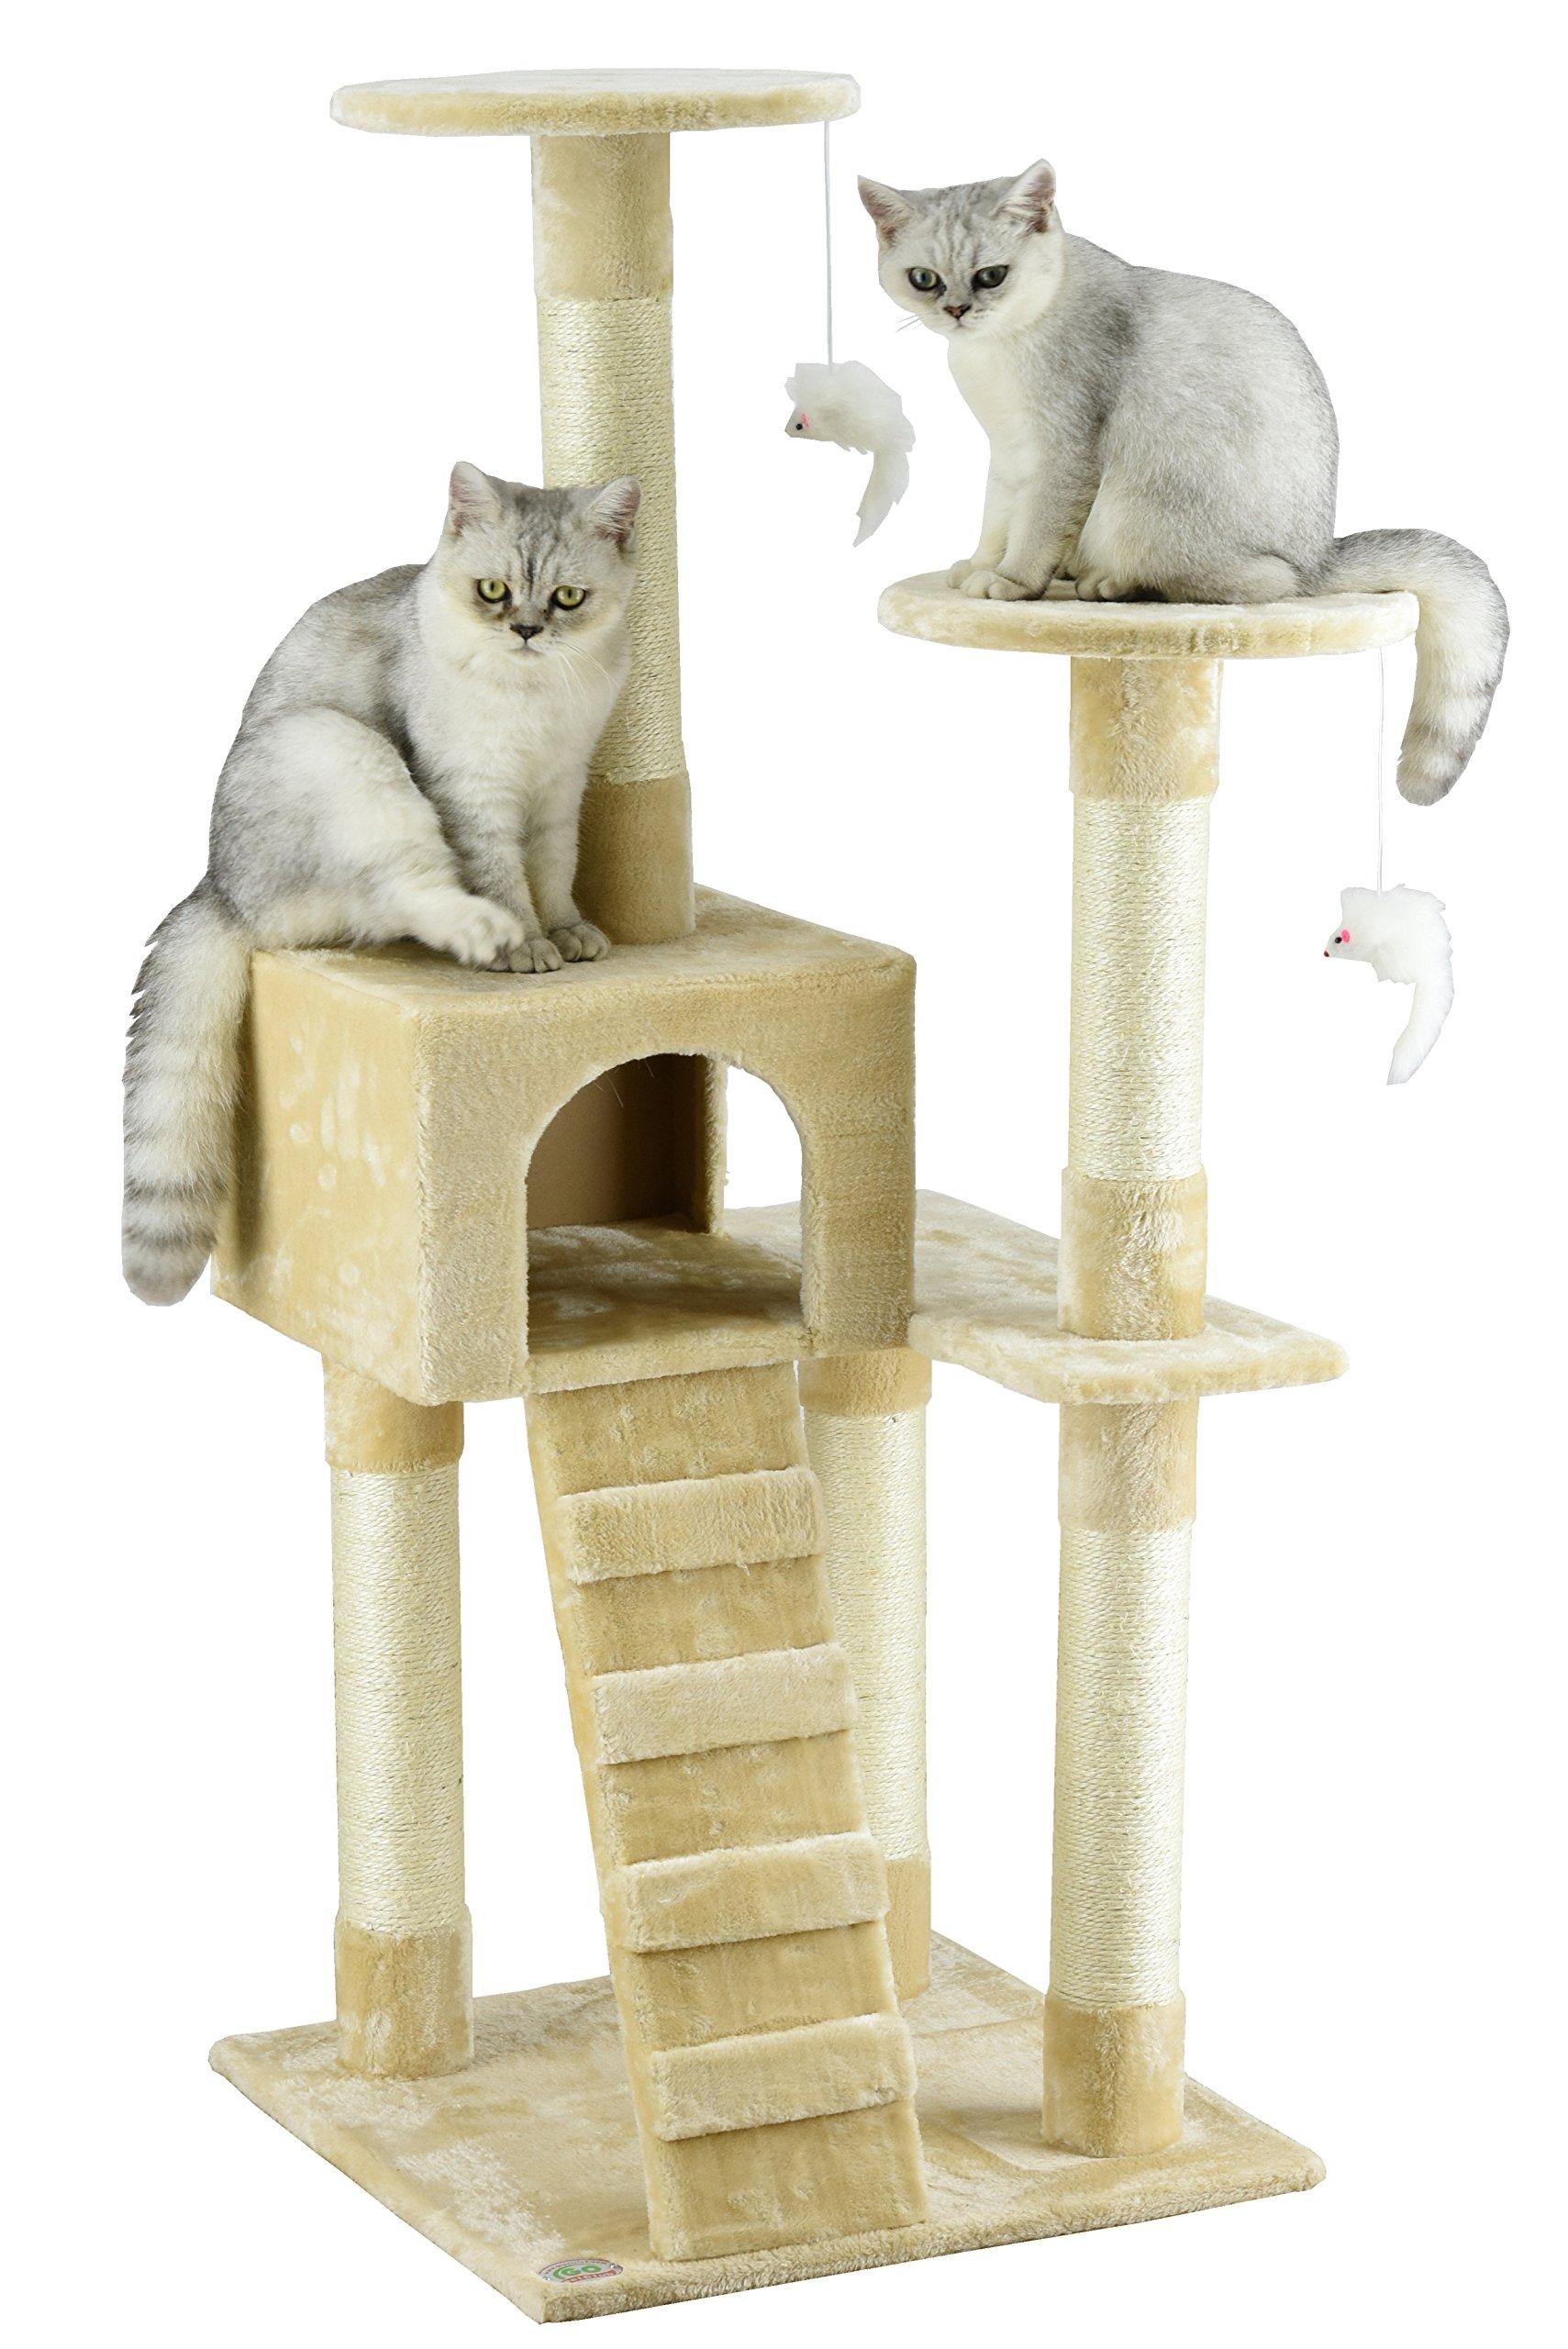 Go Pet Club Cat Tree Furniture Beige by Go Pet Club